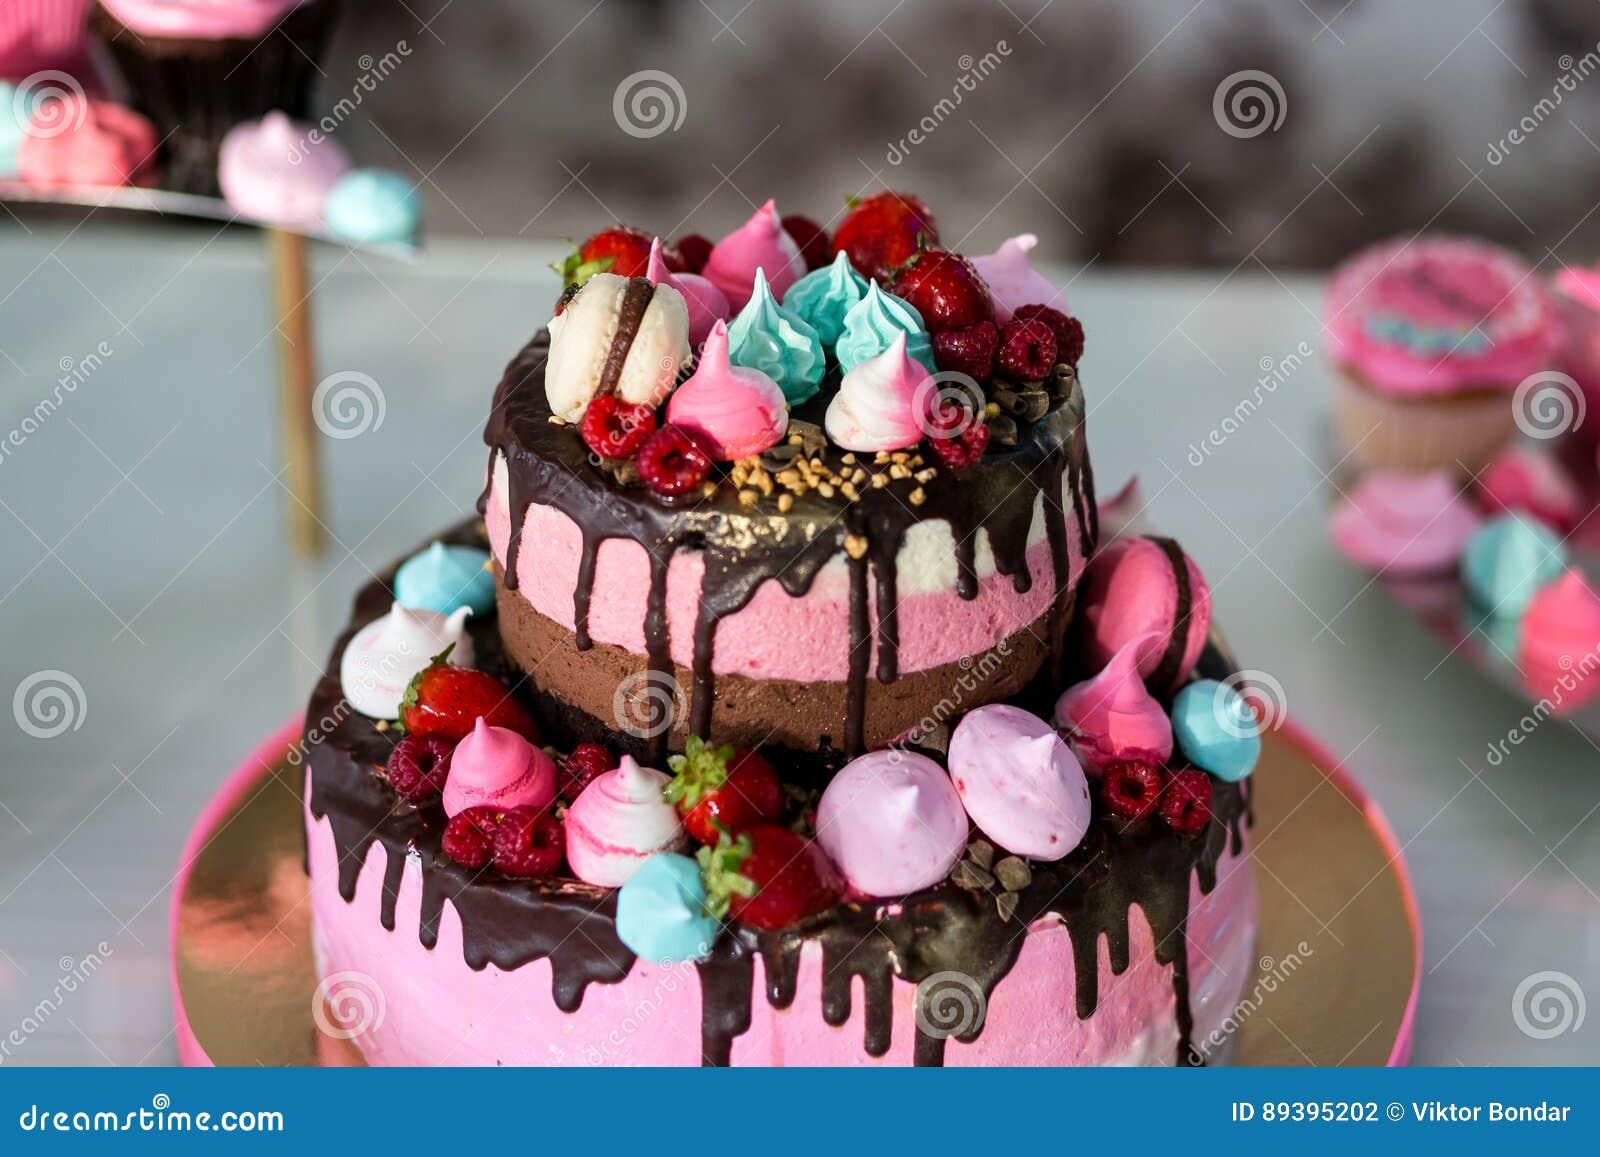 Festive Table With Sweetsic Pink Cake Kids Cake Birthday Cake